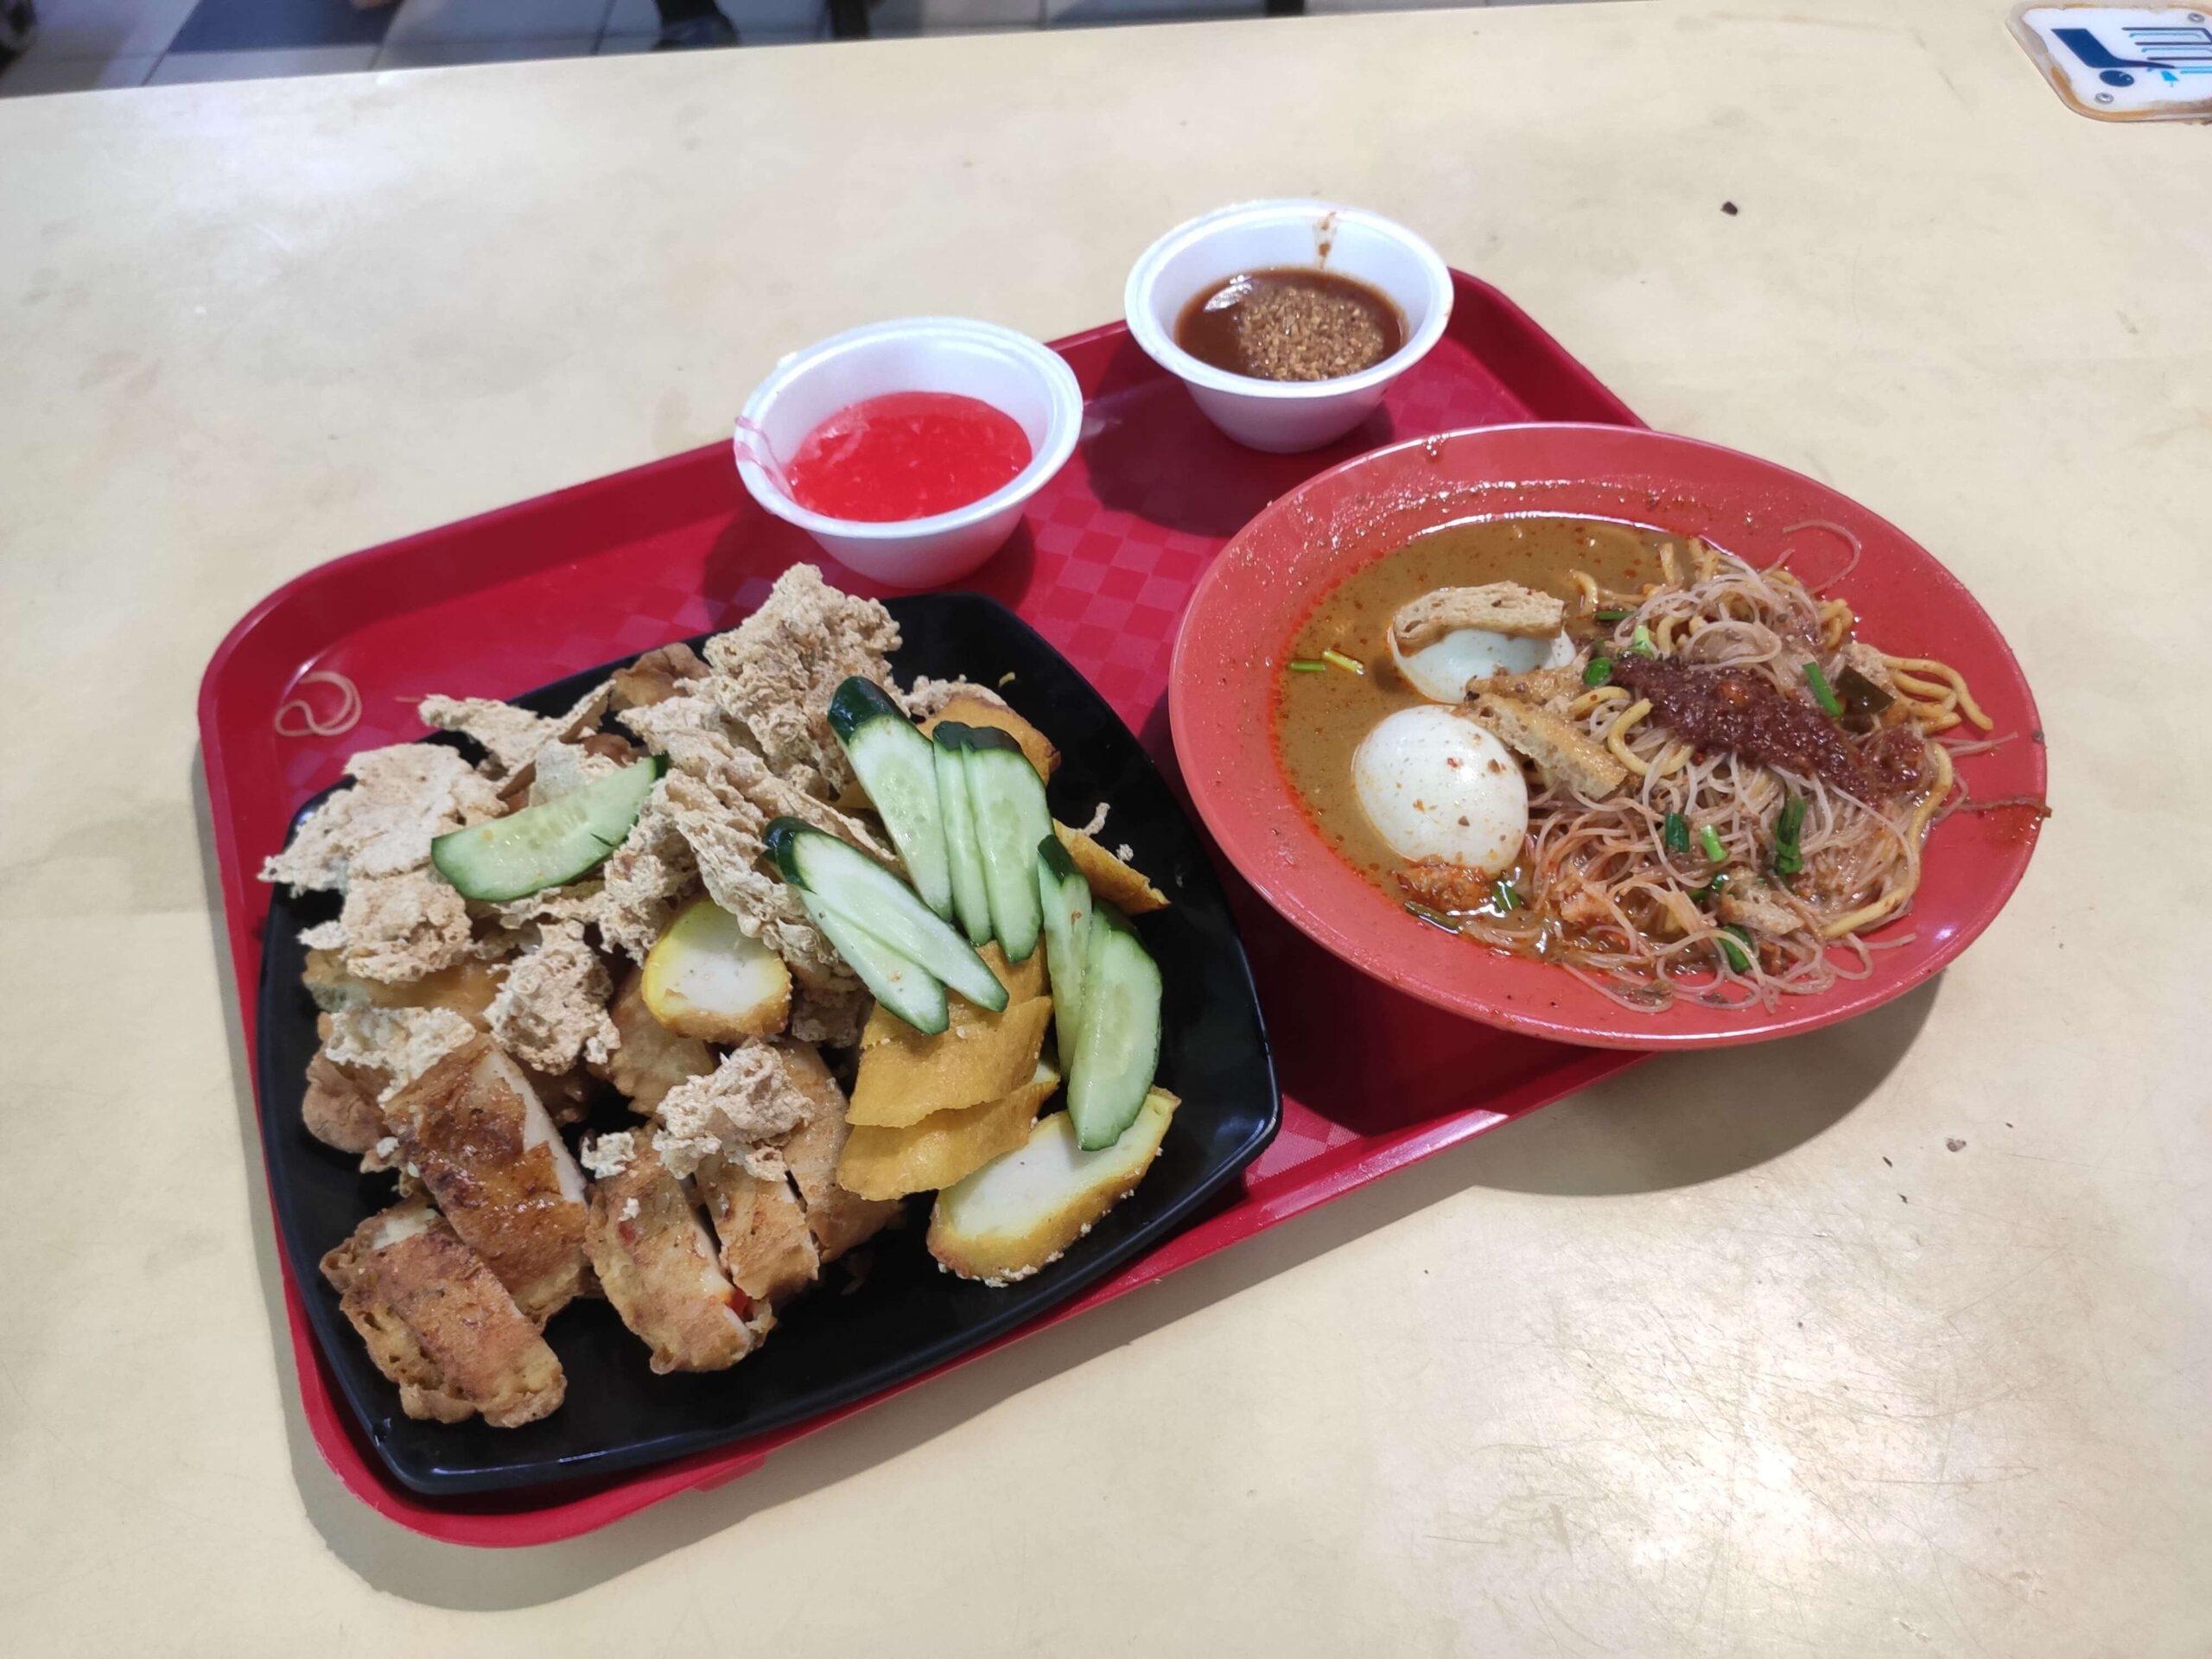 Grandma Mee Siam: Ngo Hiang & Mee Siam